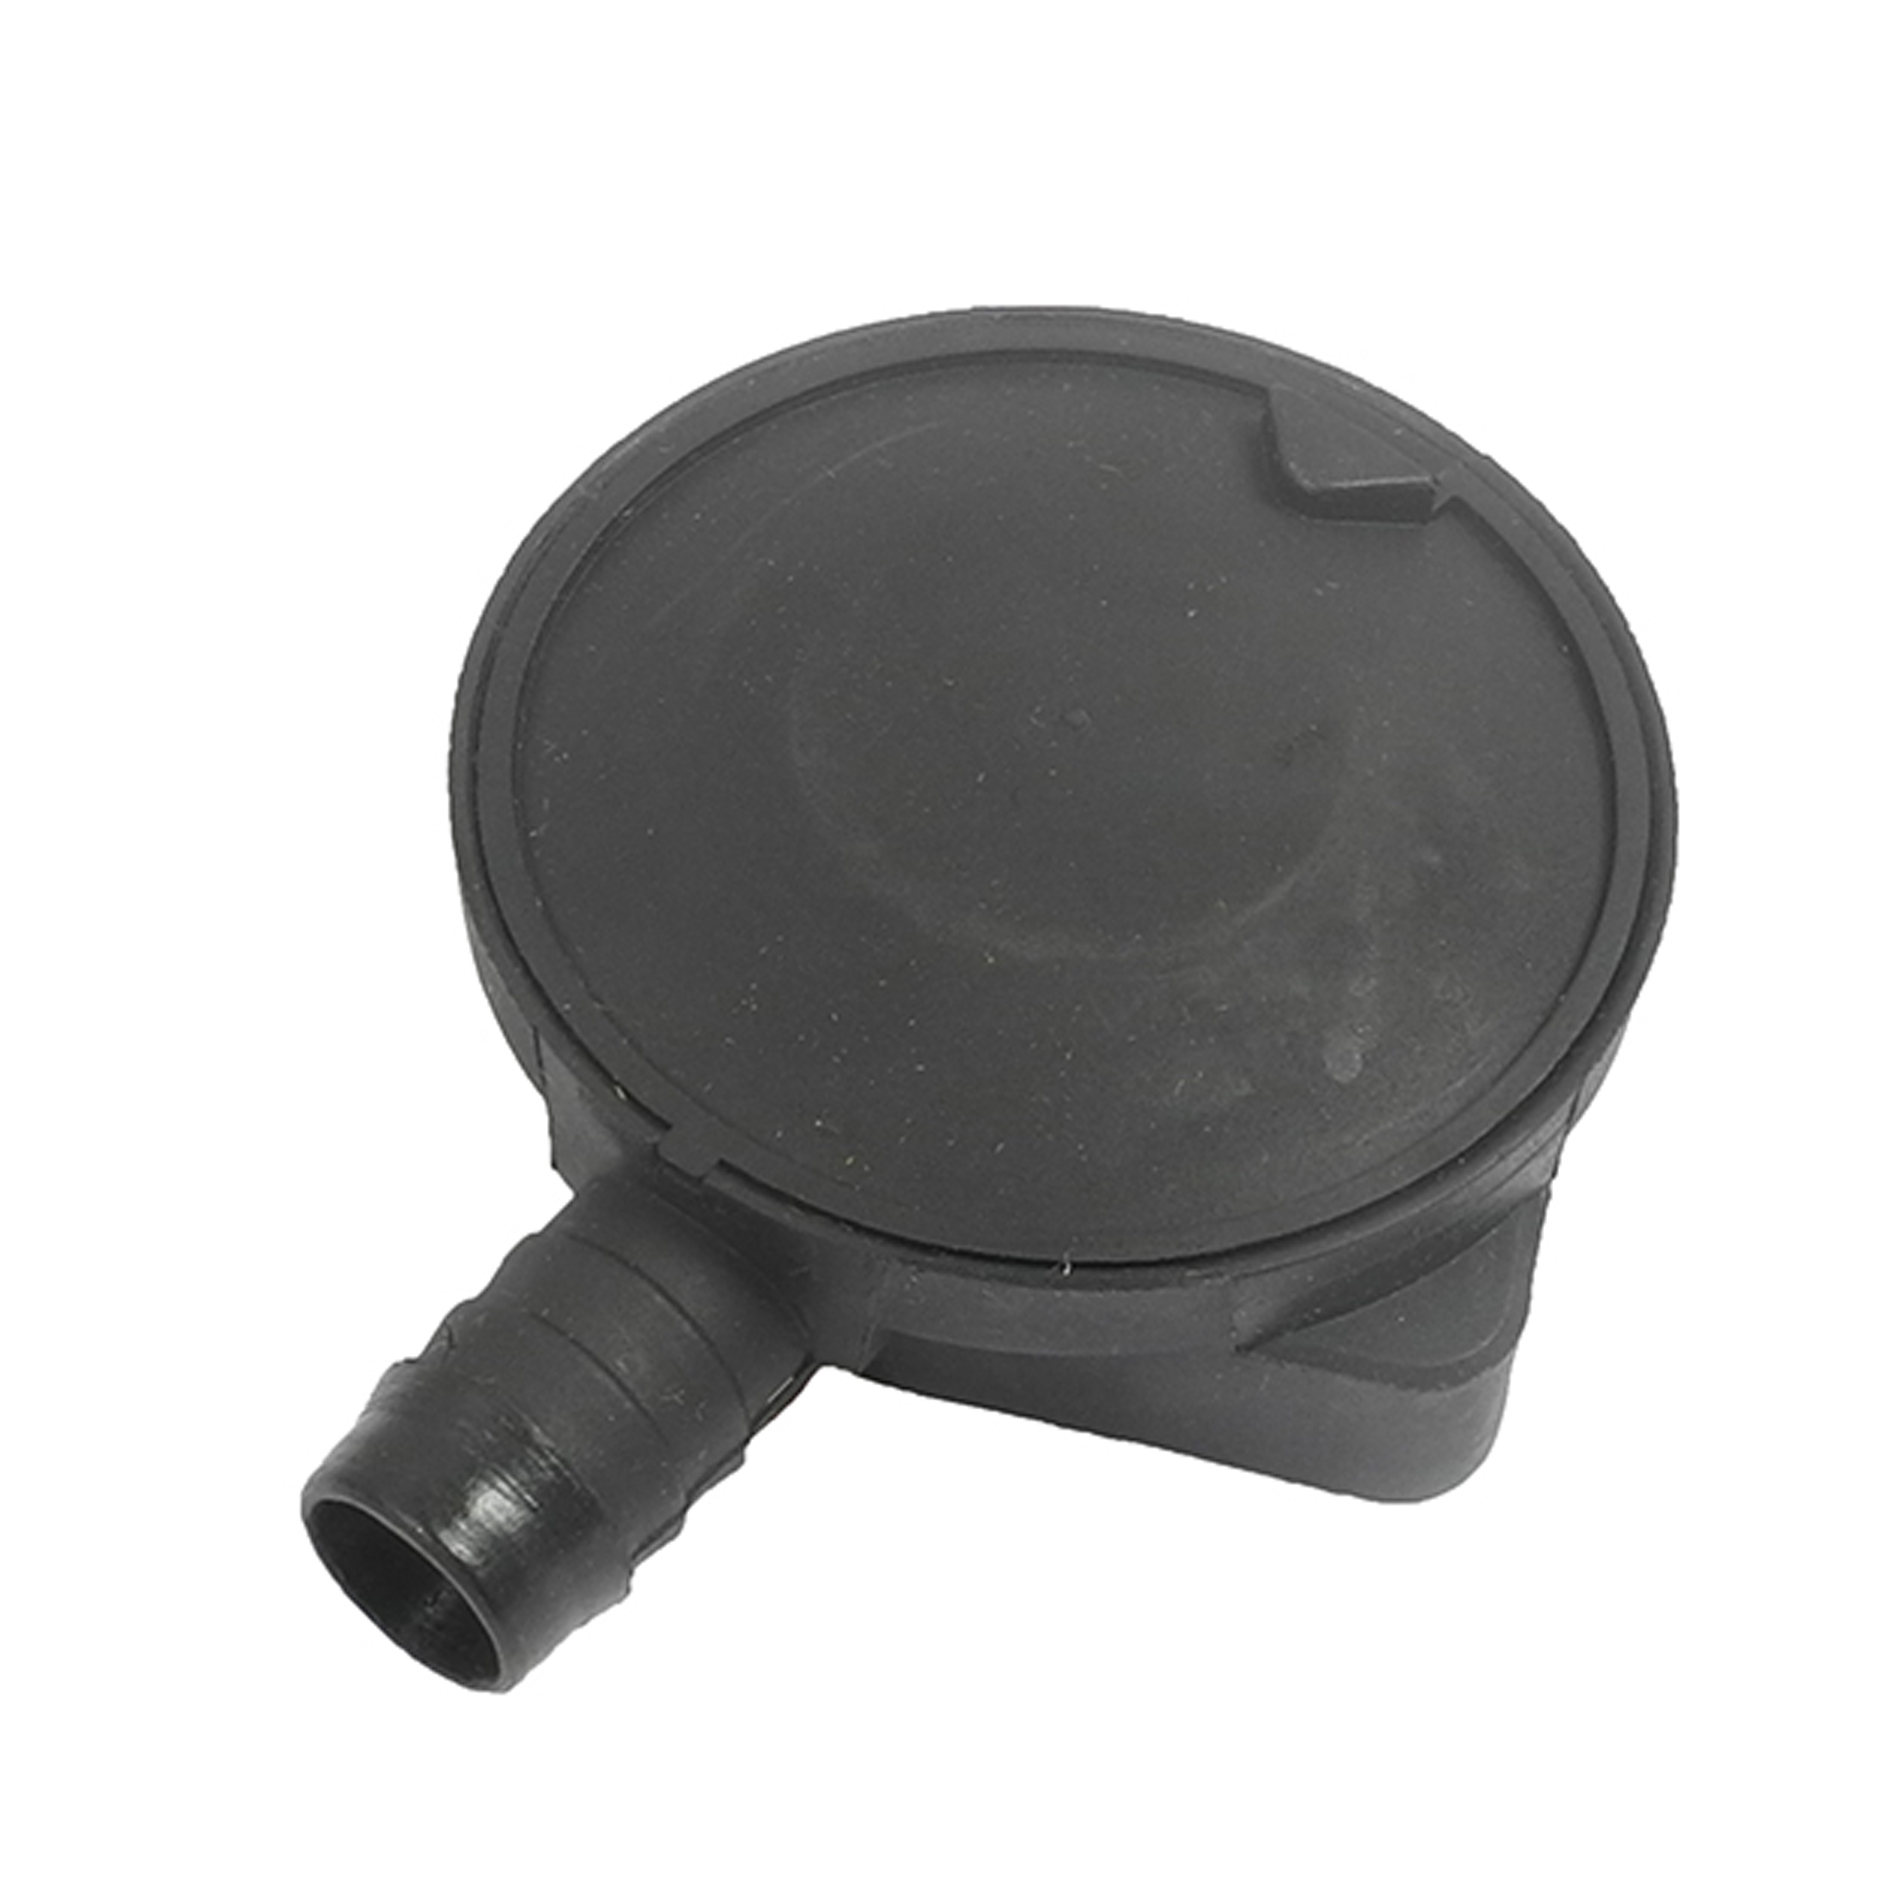 URO Parts 11157501567 Crankcase Vent Valve